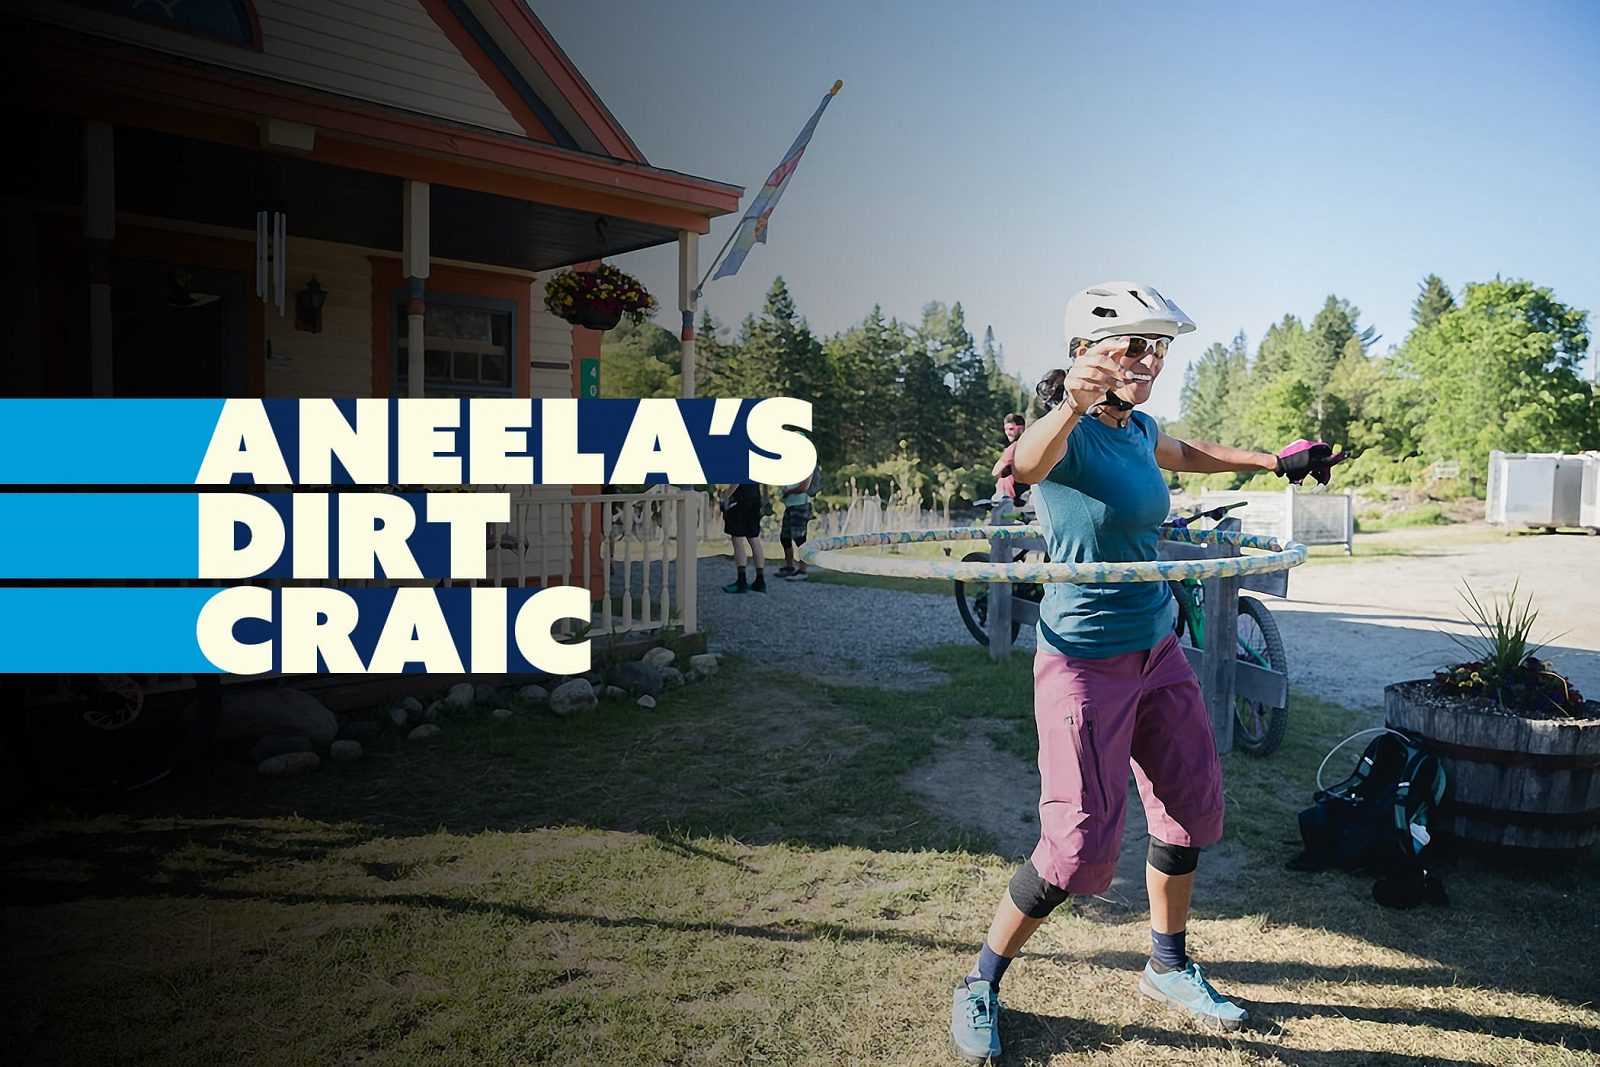 Aneela's Dirt Craic: Be Your Own Duchess